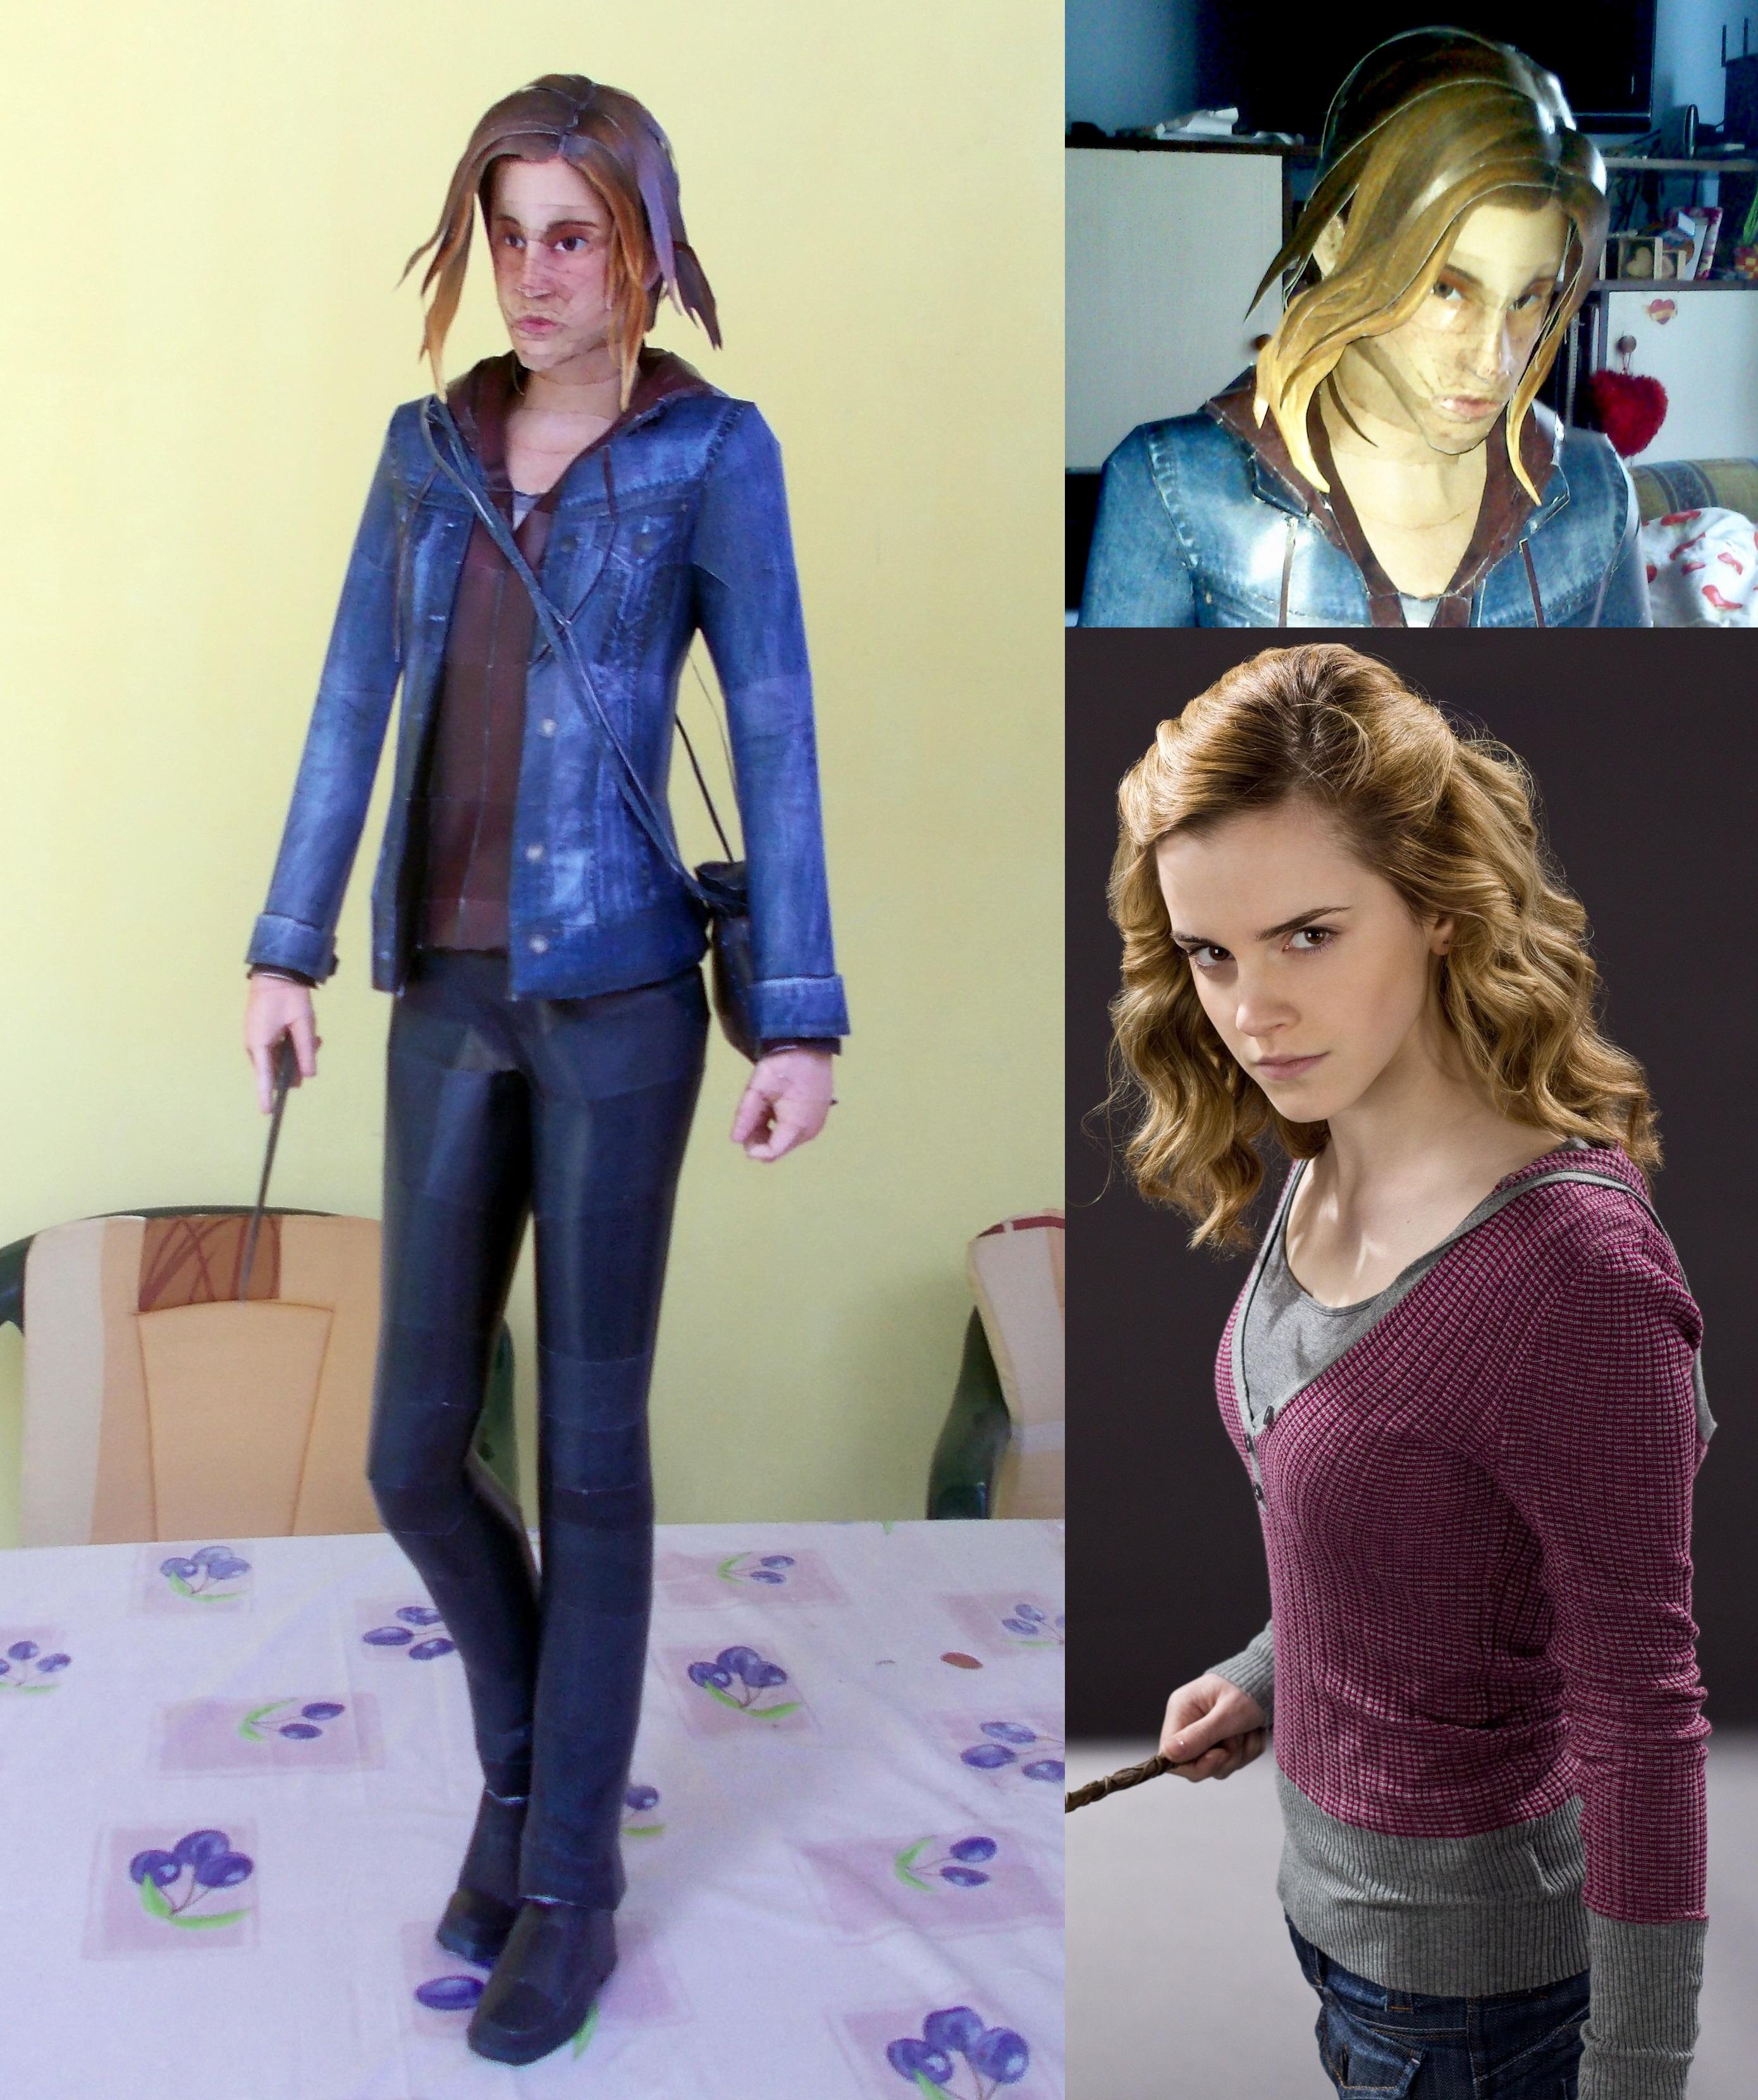 Hermione Granger / Emma Watson Papercraft by Sabi996